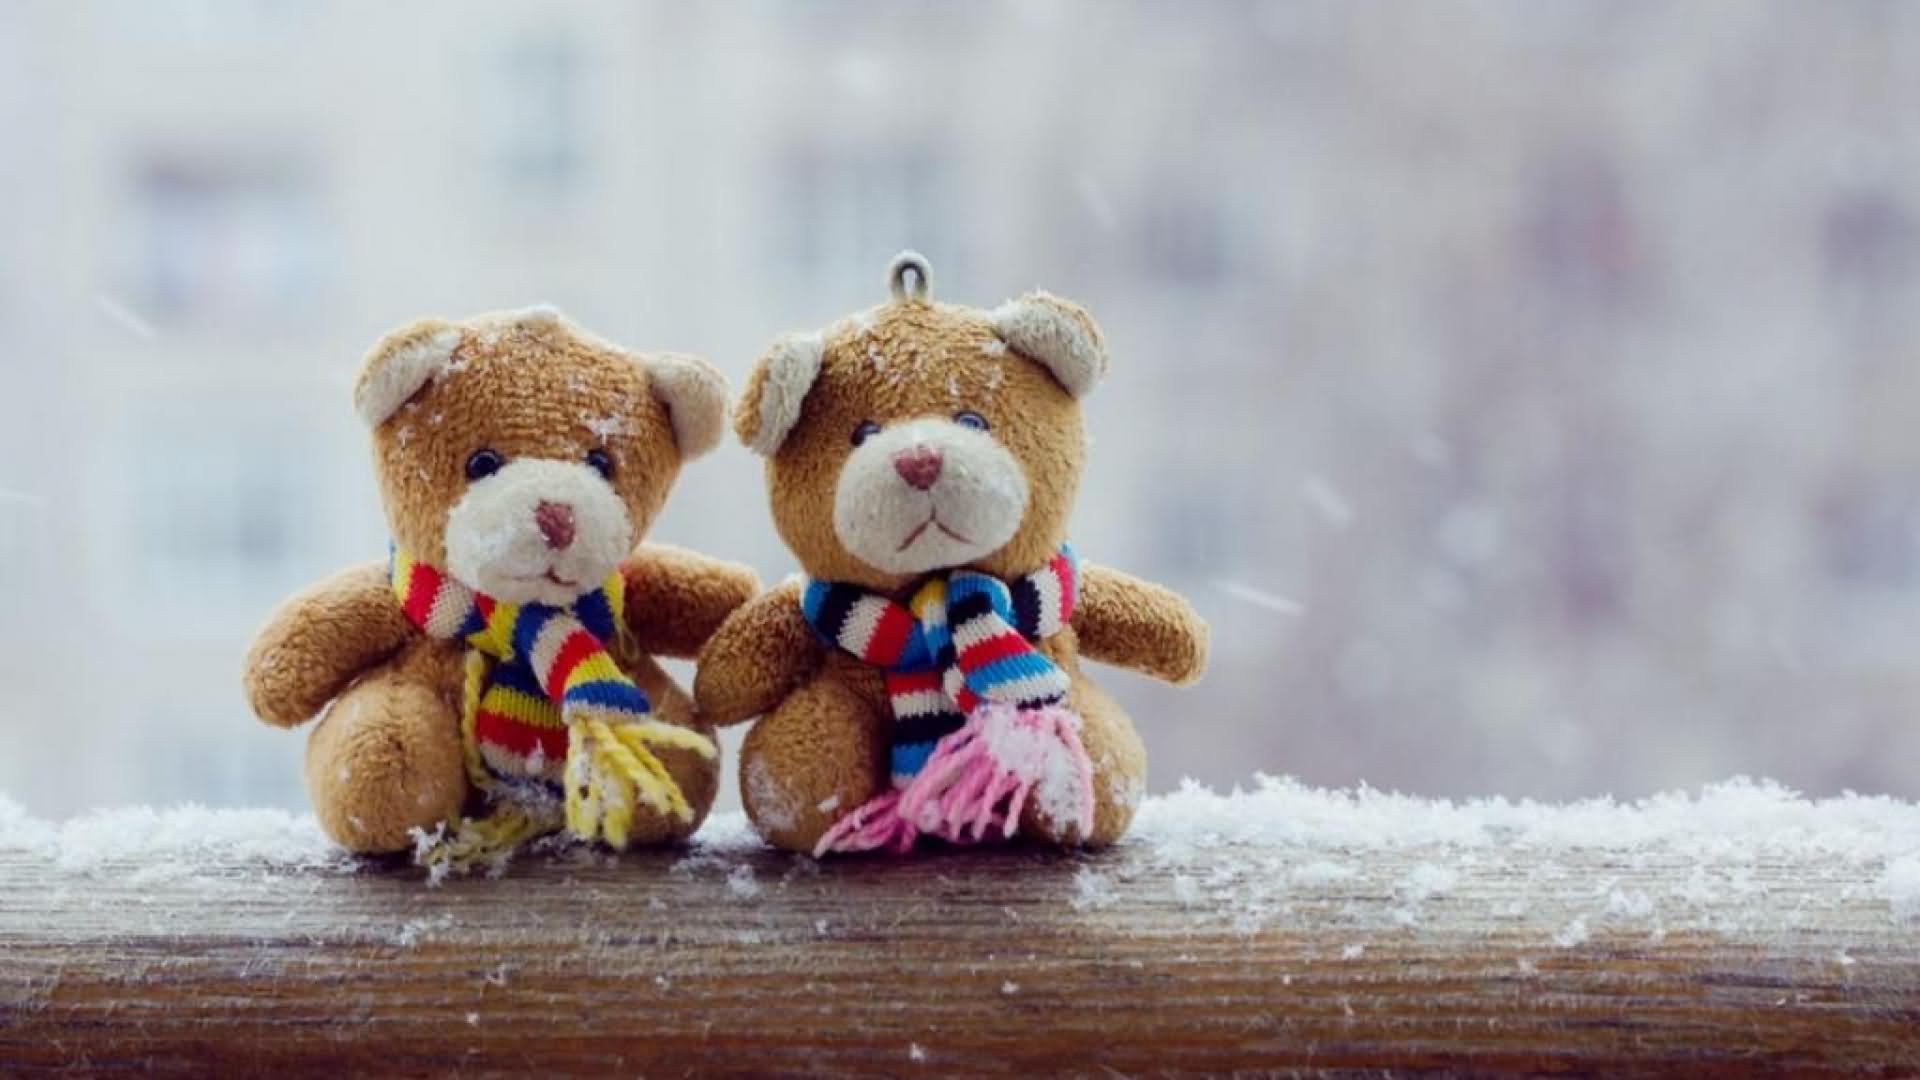 Cute Teddy Bears Friends Forever HD Wallpaper | PunjabiGraphics com